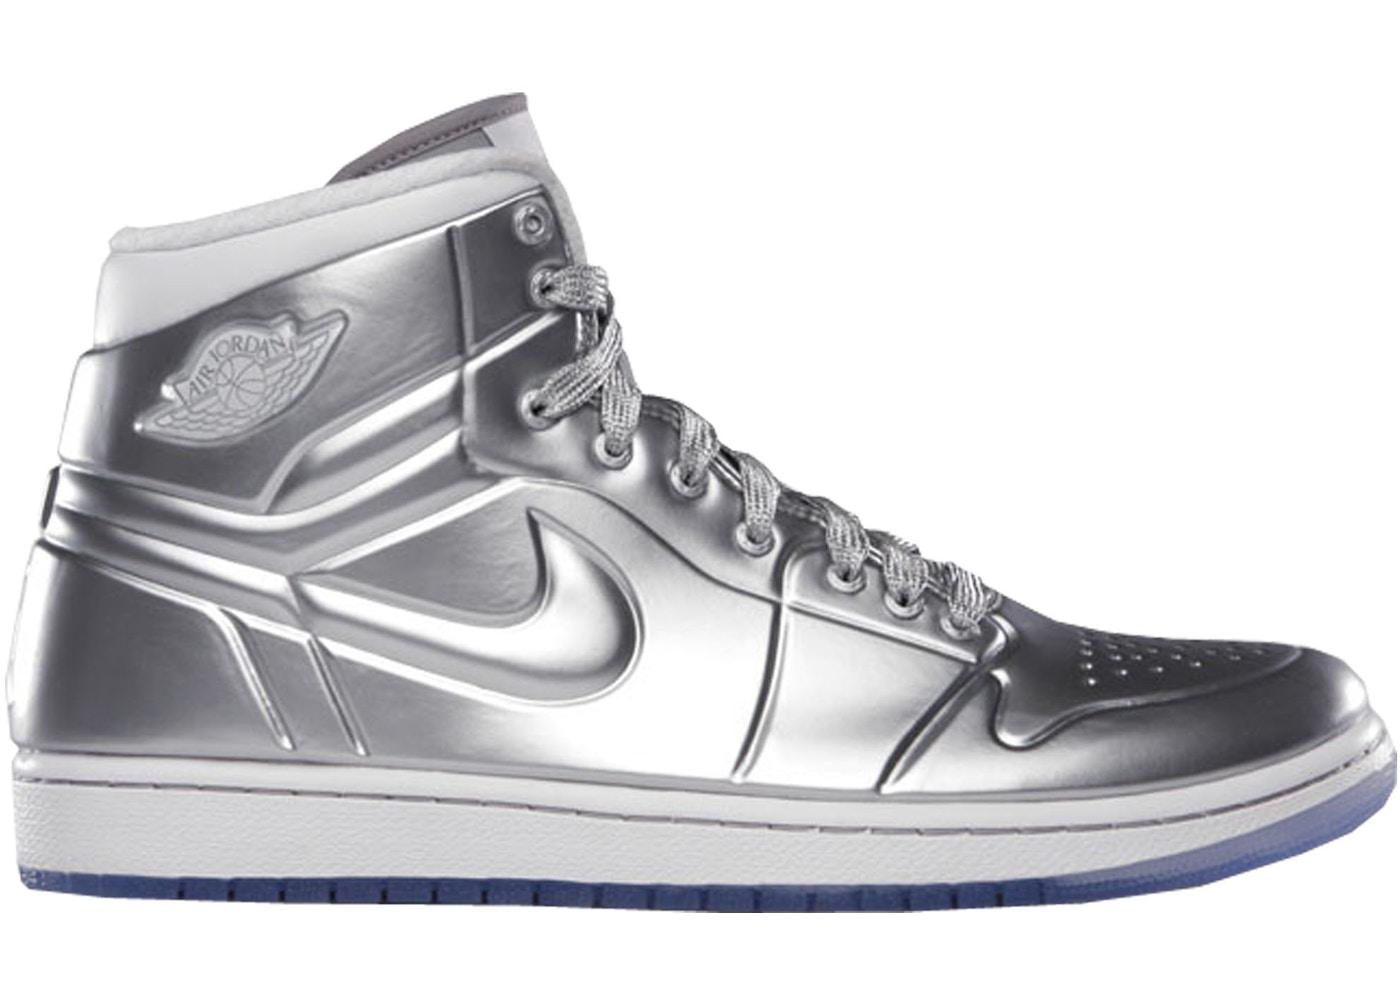 free shipping 814b6 38c49 Jordan 1 Anodized Silver